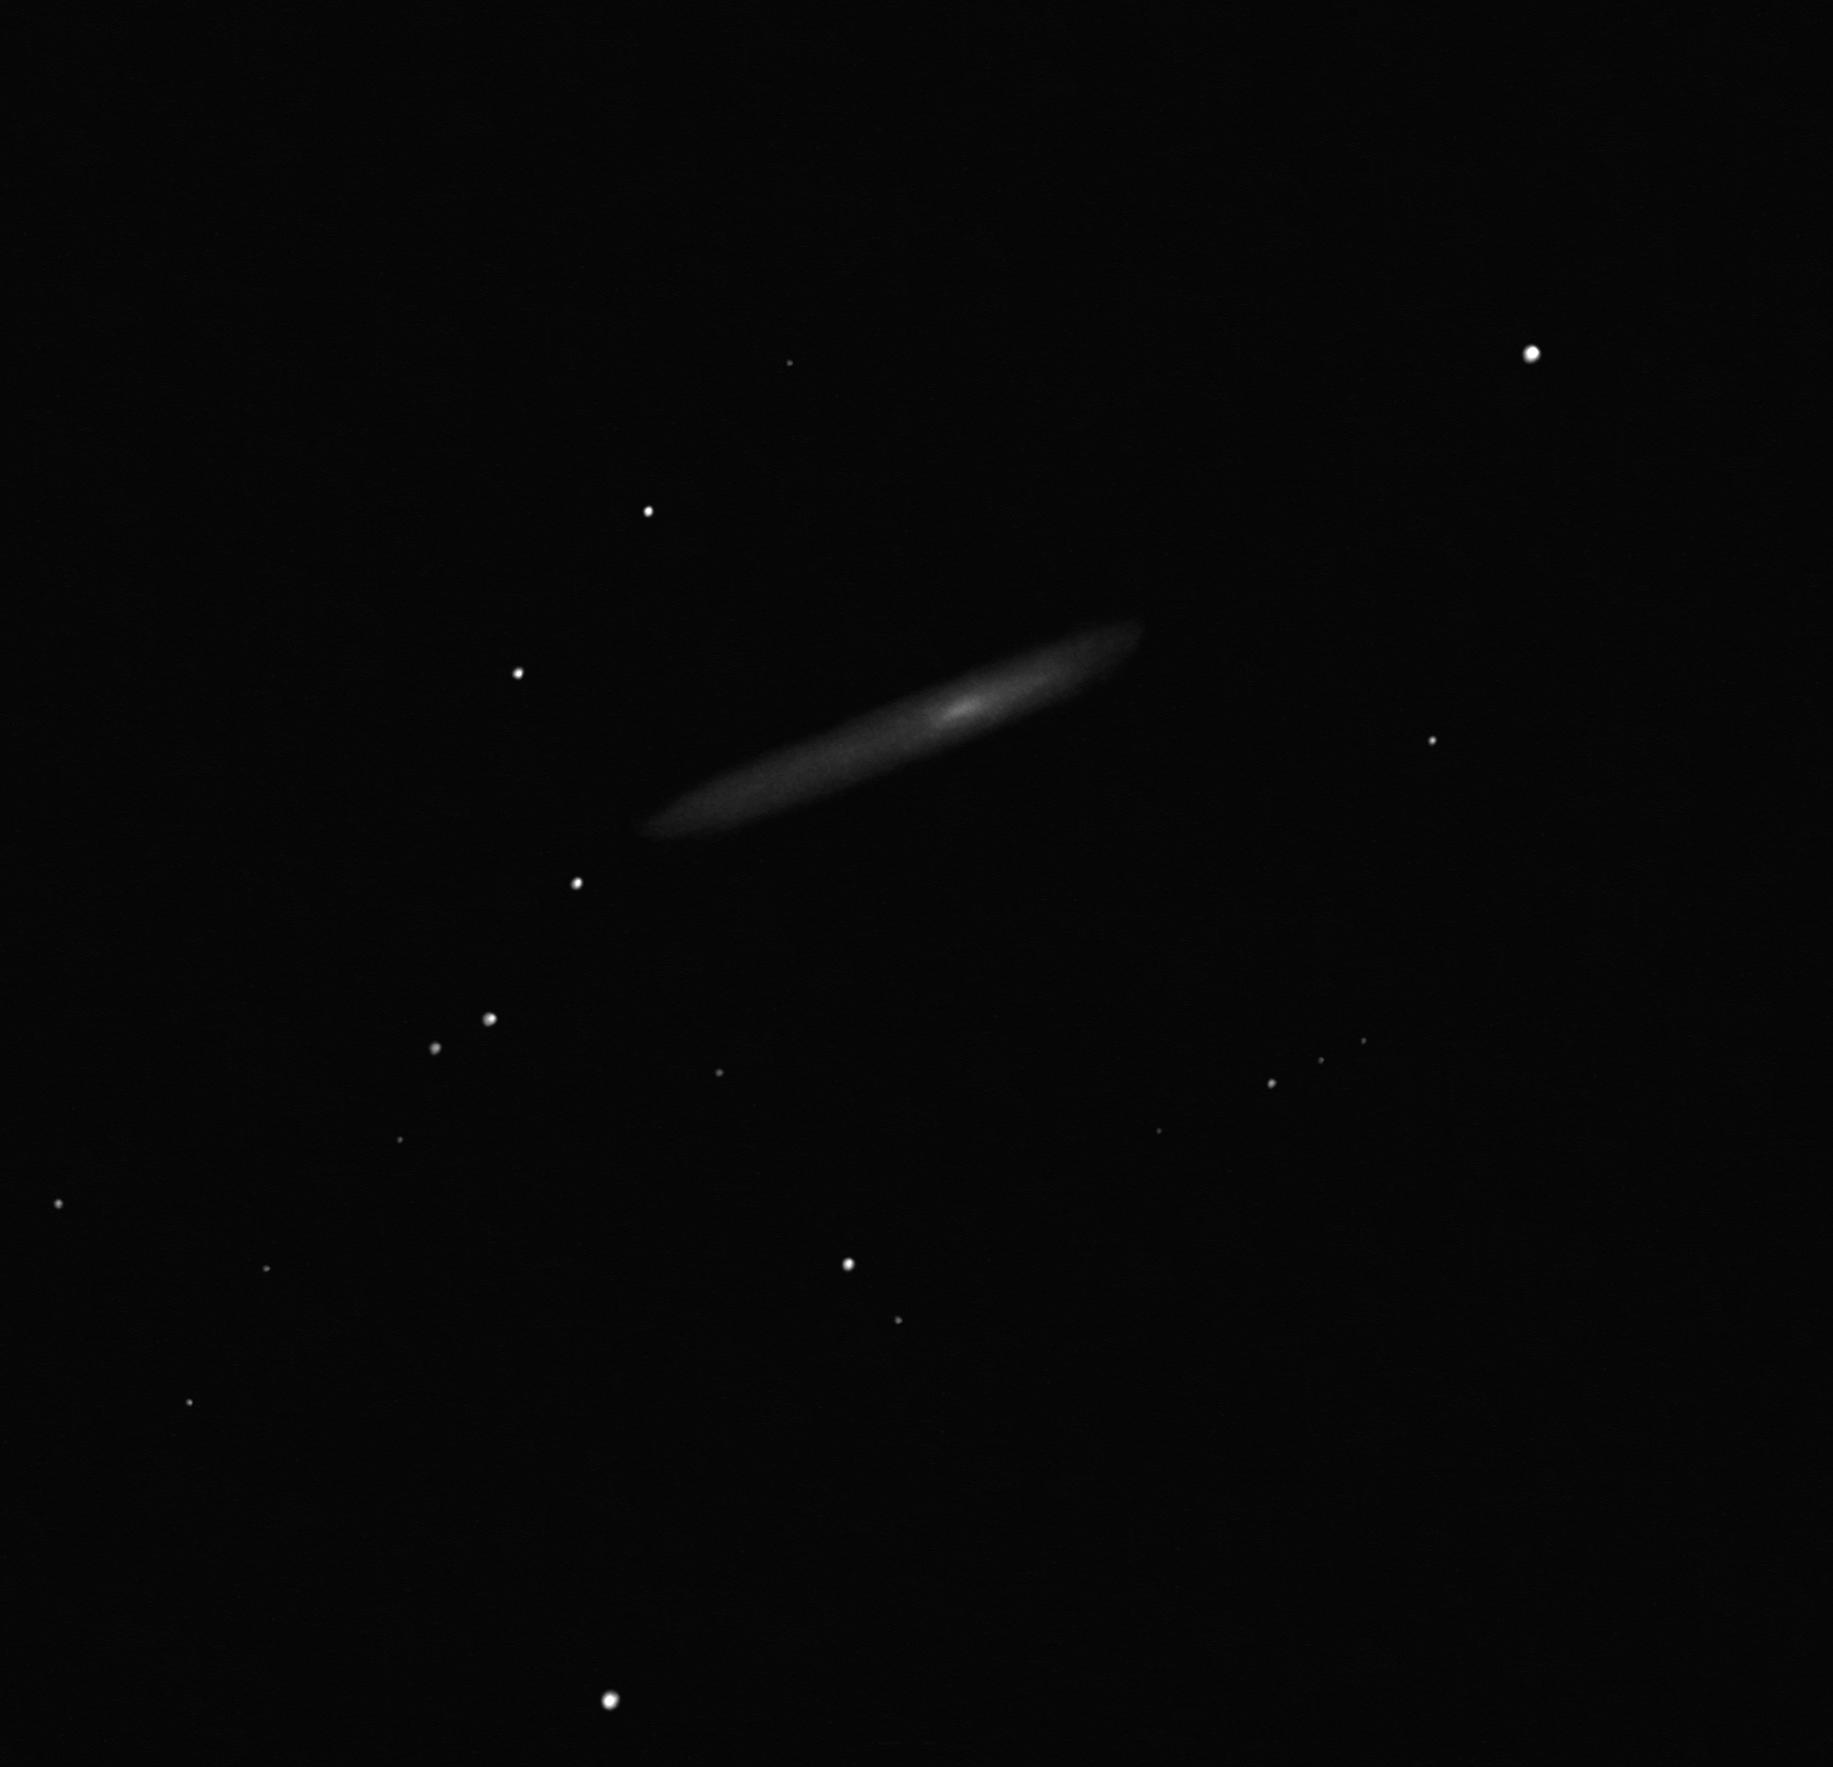 ngc 55 galaxy